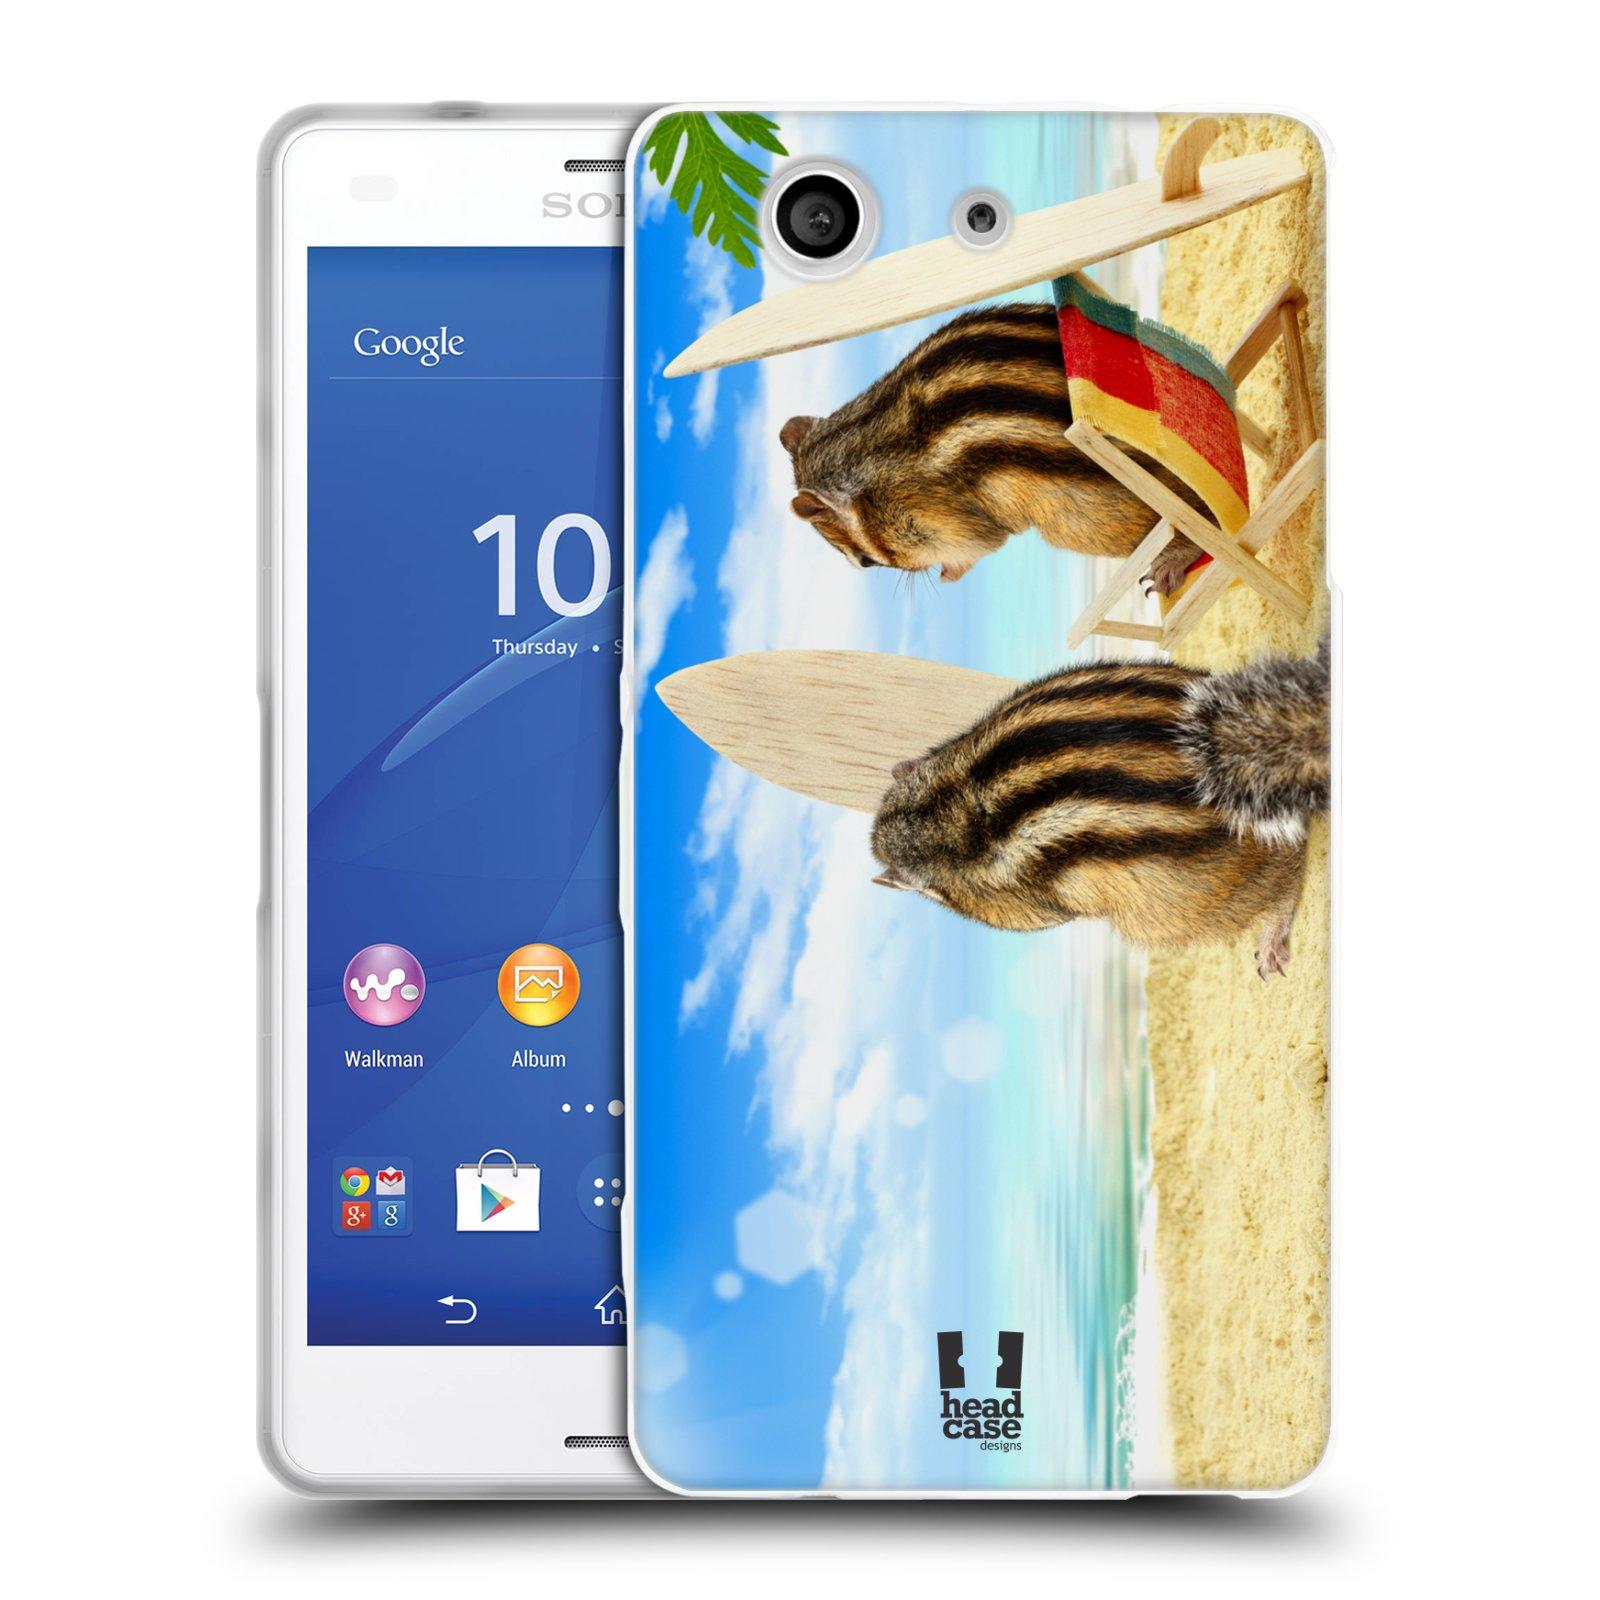 HEAD CASE silikonový obal na mobil Sony Xperia Z3 COMPACT (D5803) vzor Legrační zvířátka veverky surfaři u moře